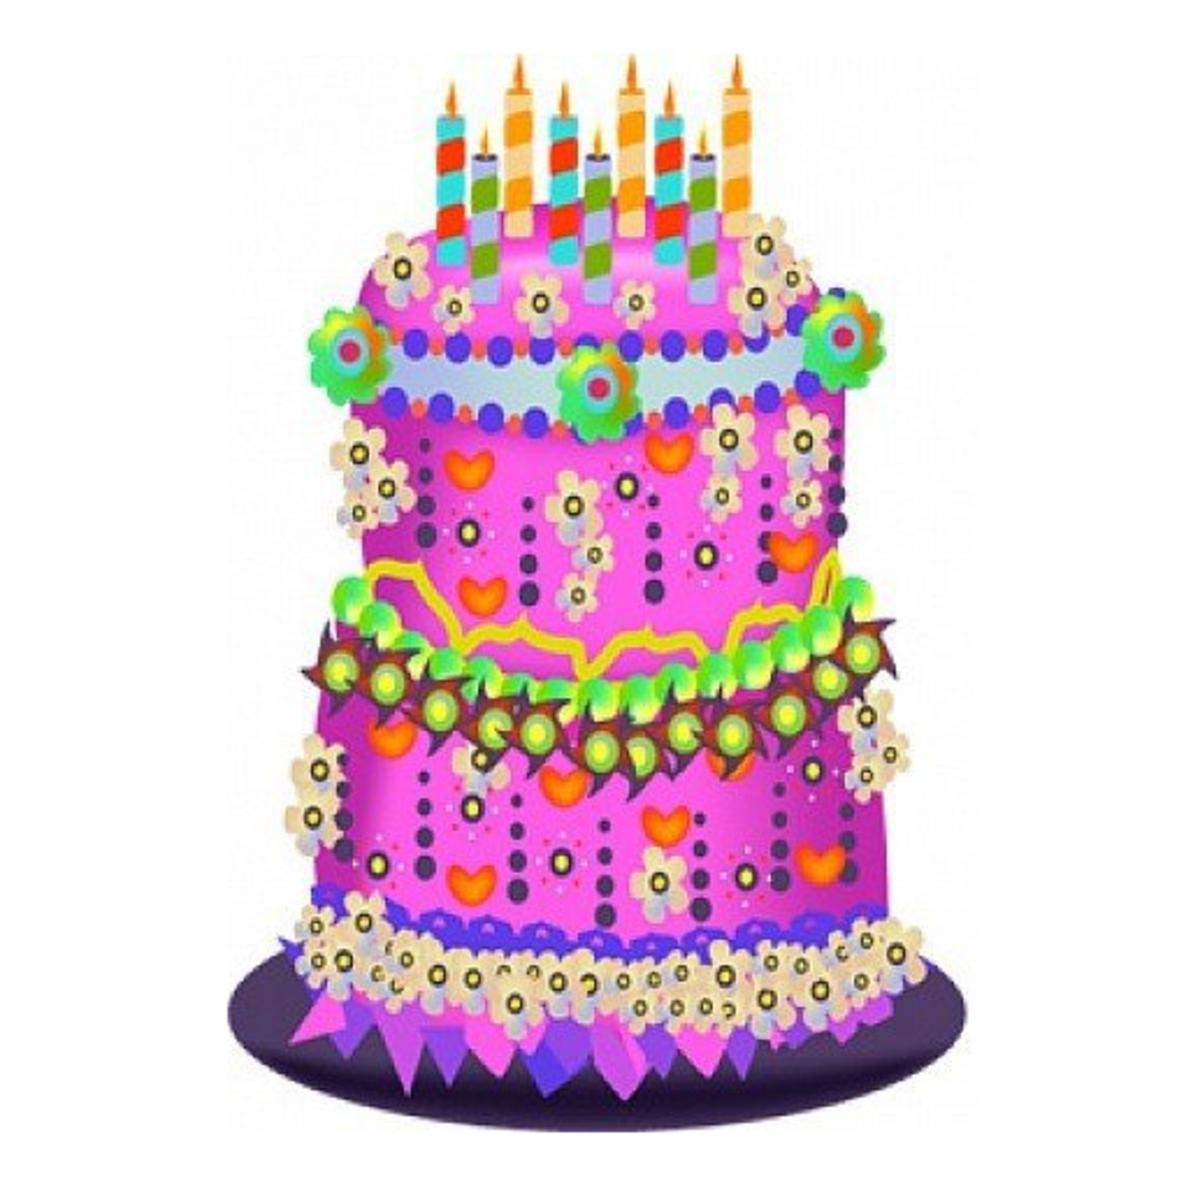 Three-Tier Pink and Purple Birthday Cake